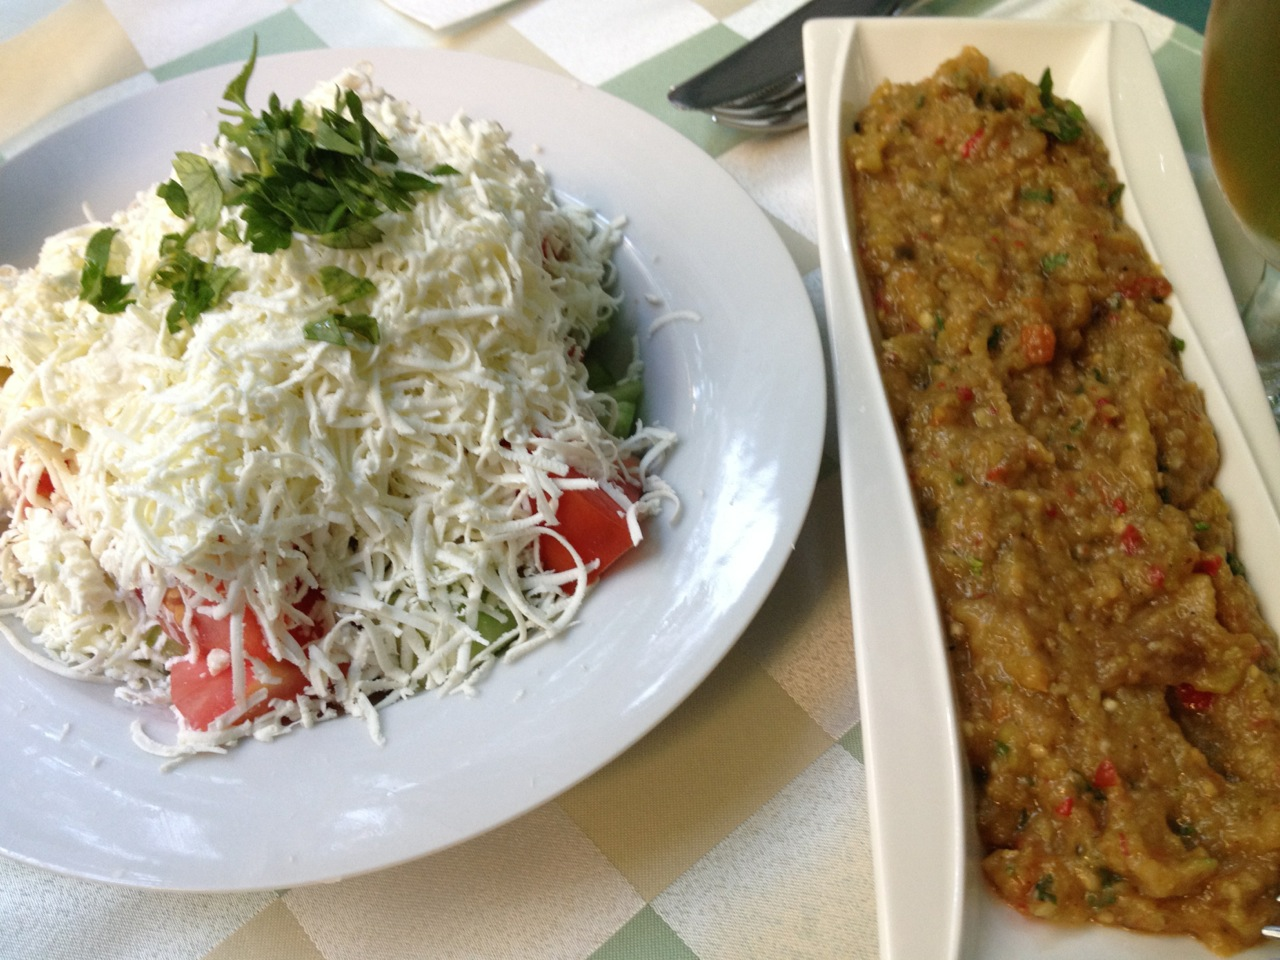 Shopska Salad and Eggplant (Патладжан) Starter